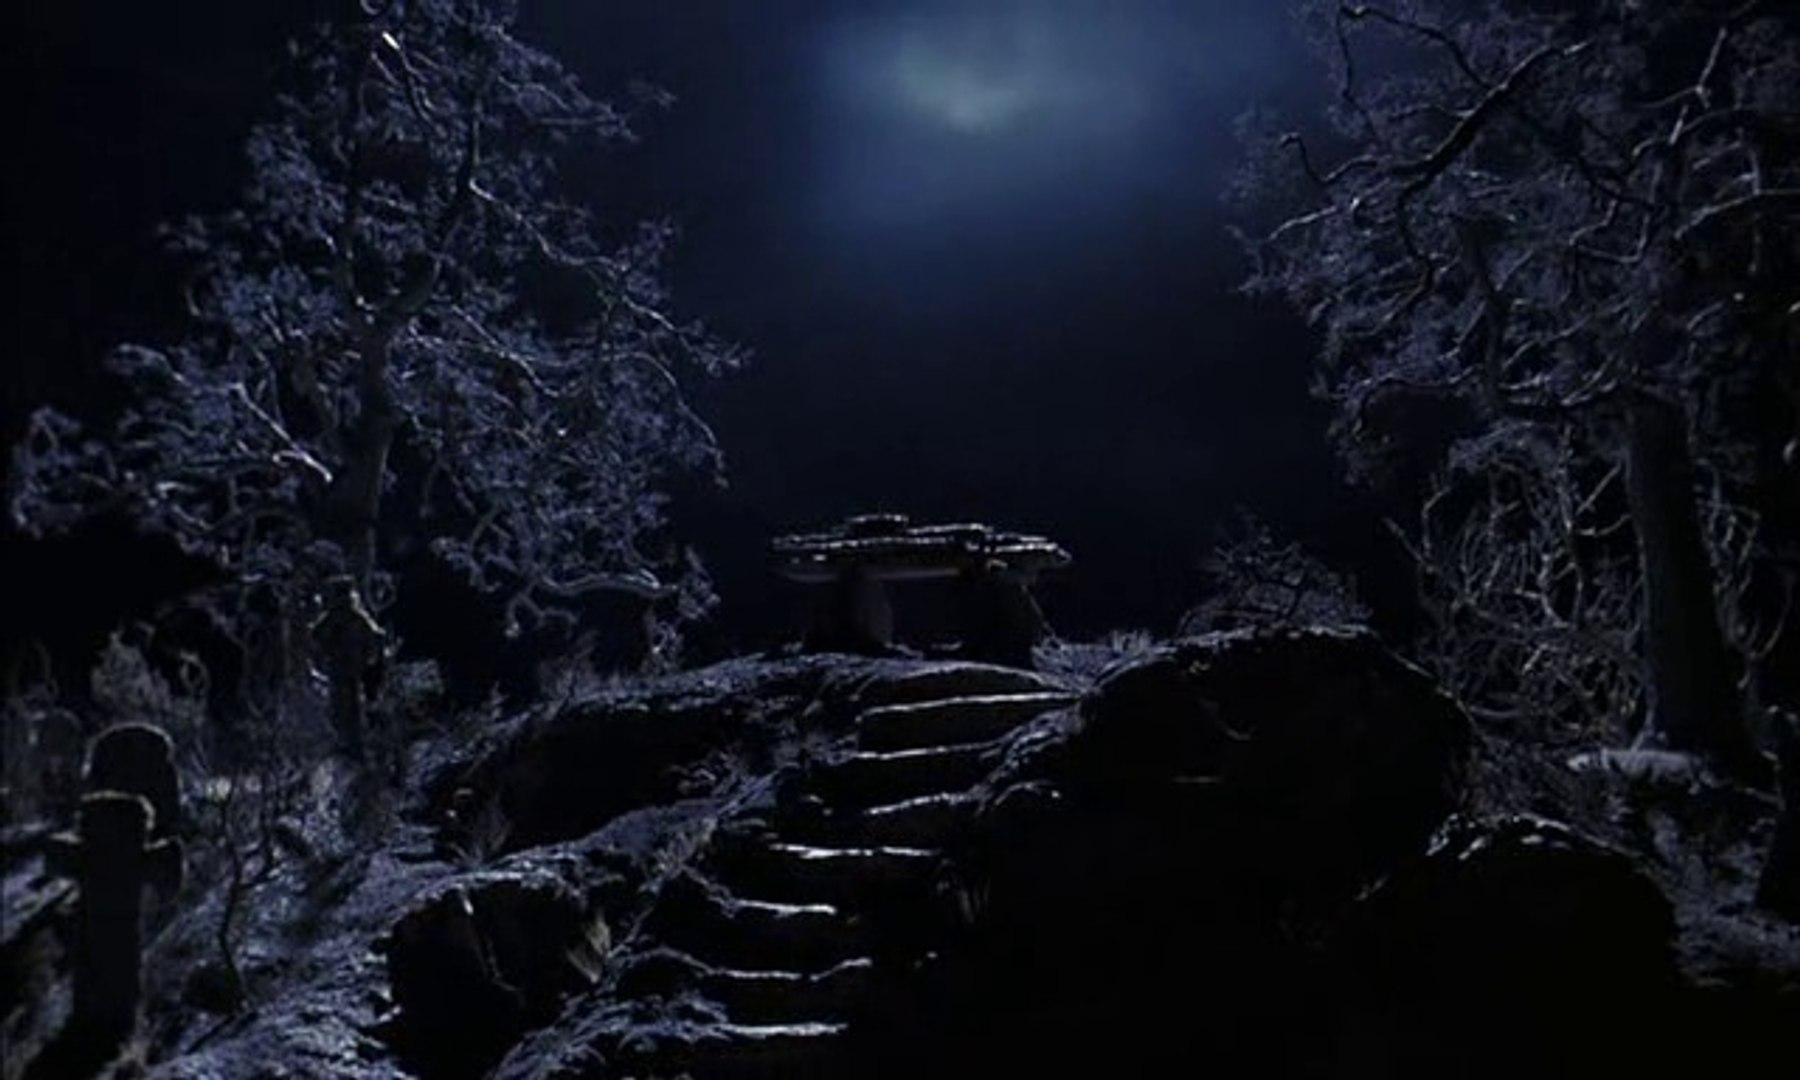 Evil Dead III - Army of Darkness(1992) - Español latino pelicula completa HD